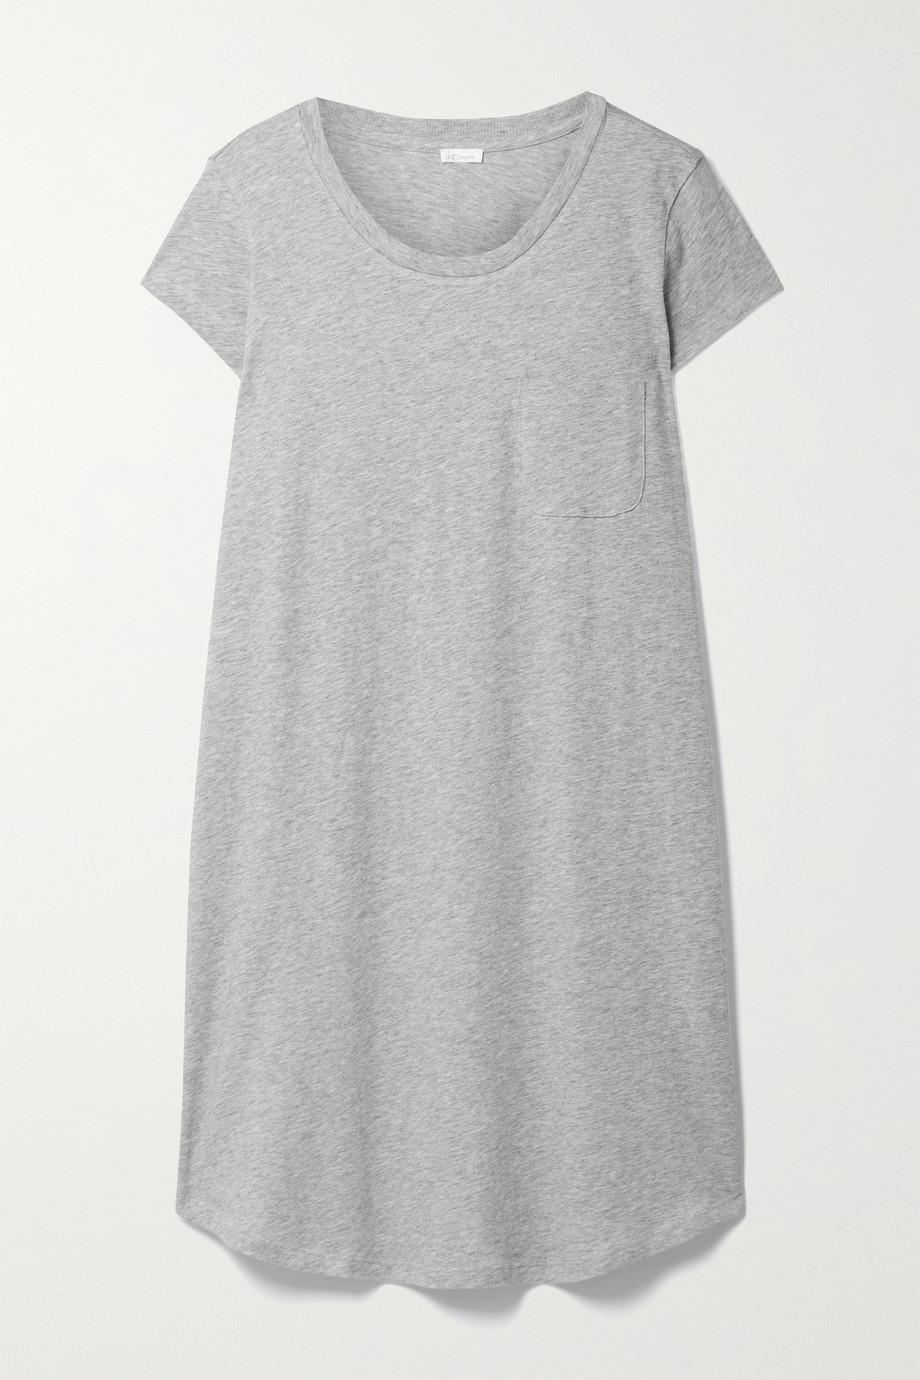 Skin + NET SUSTAIN Carissa mélange organic Pima cotton-jersey nightdress